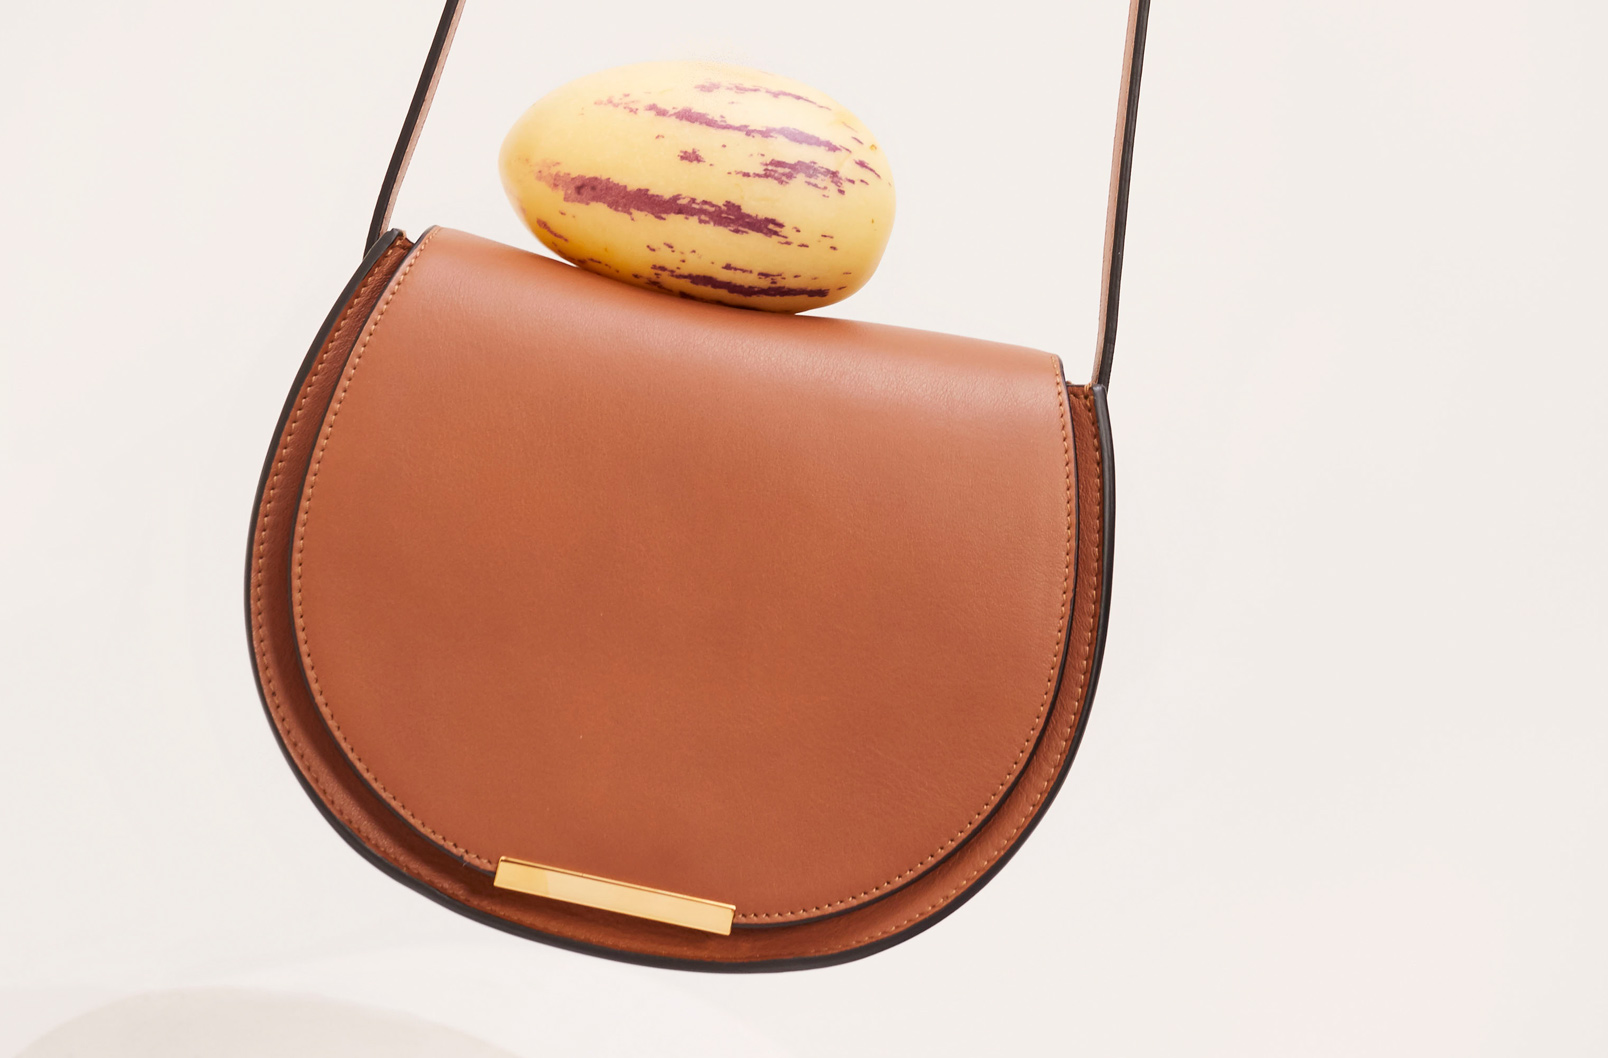 Cuyana Mini Saddle Bag in Caramel with fruit